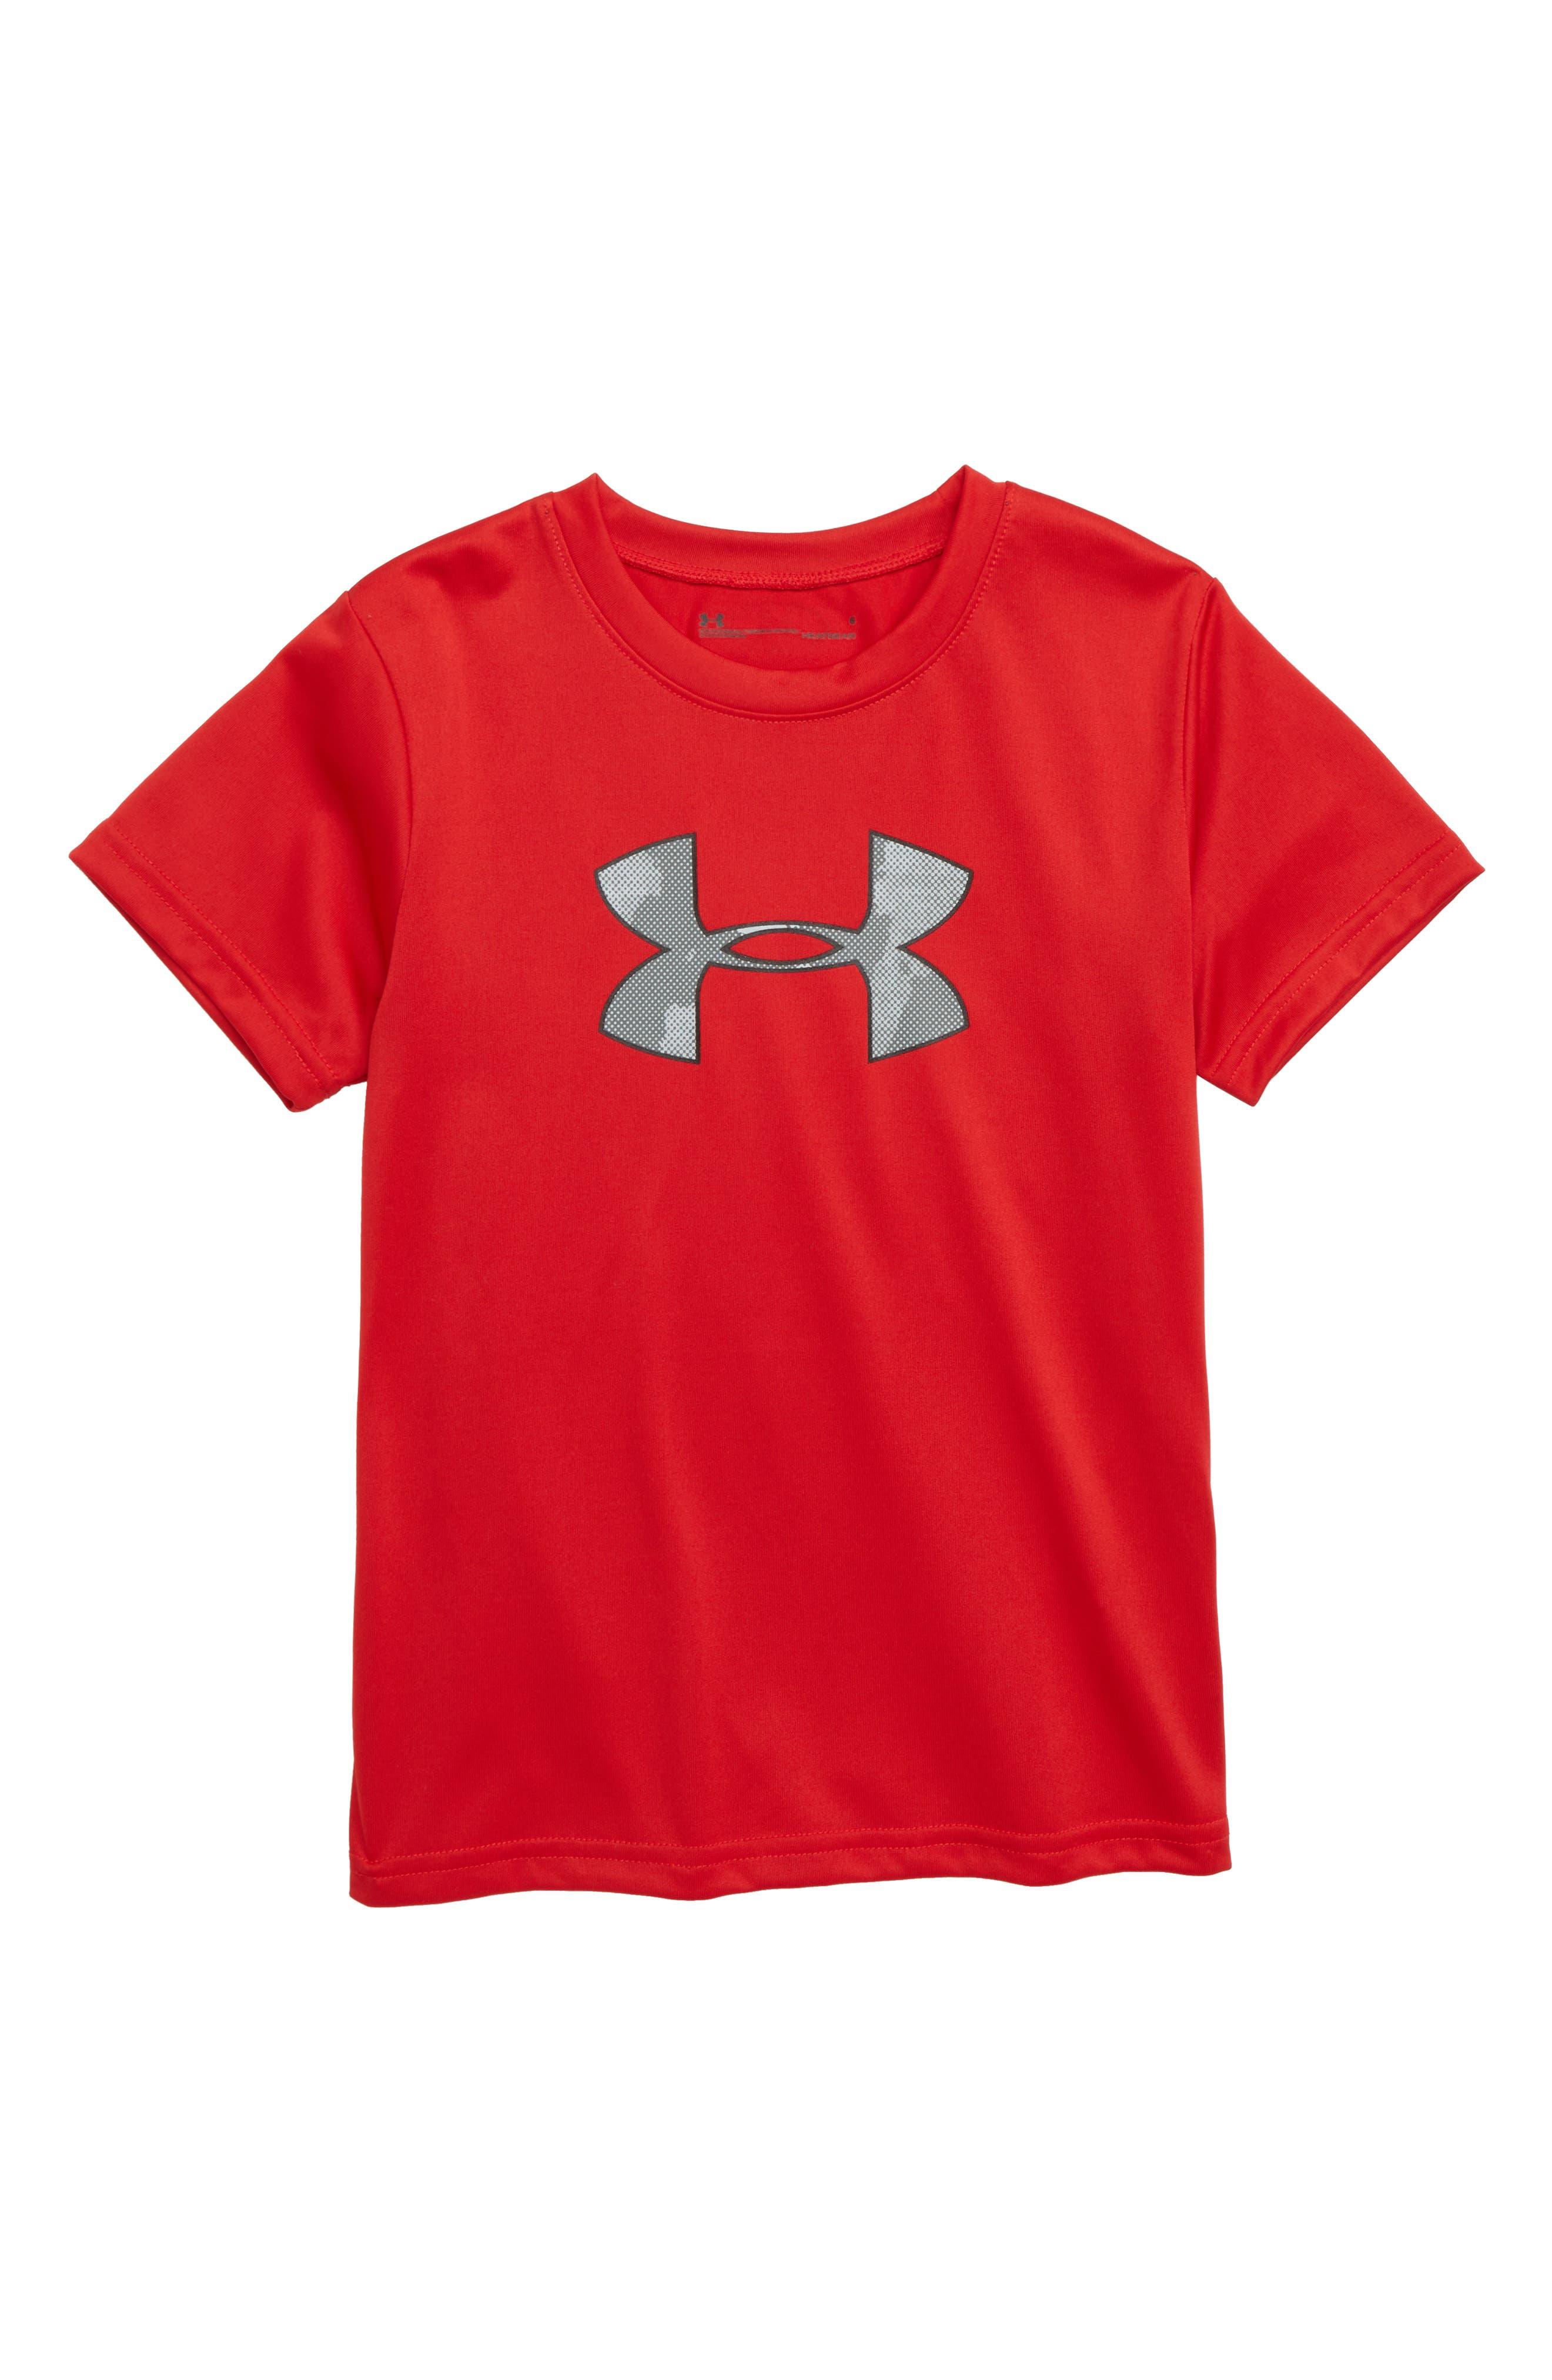 UNDER ARMOUR Traverse Camo Logo T-Shirt, Main, color, 600